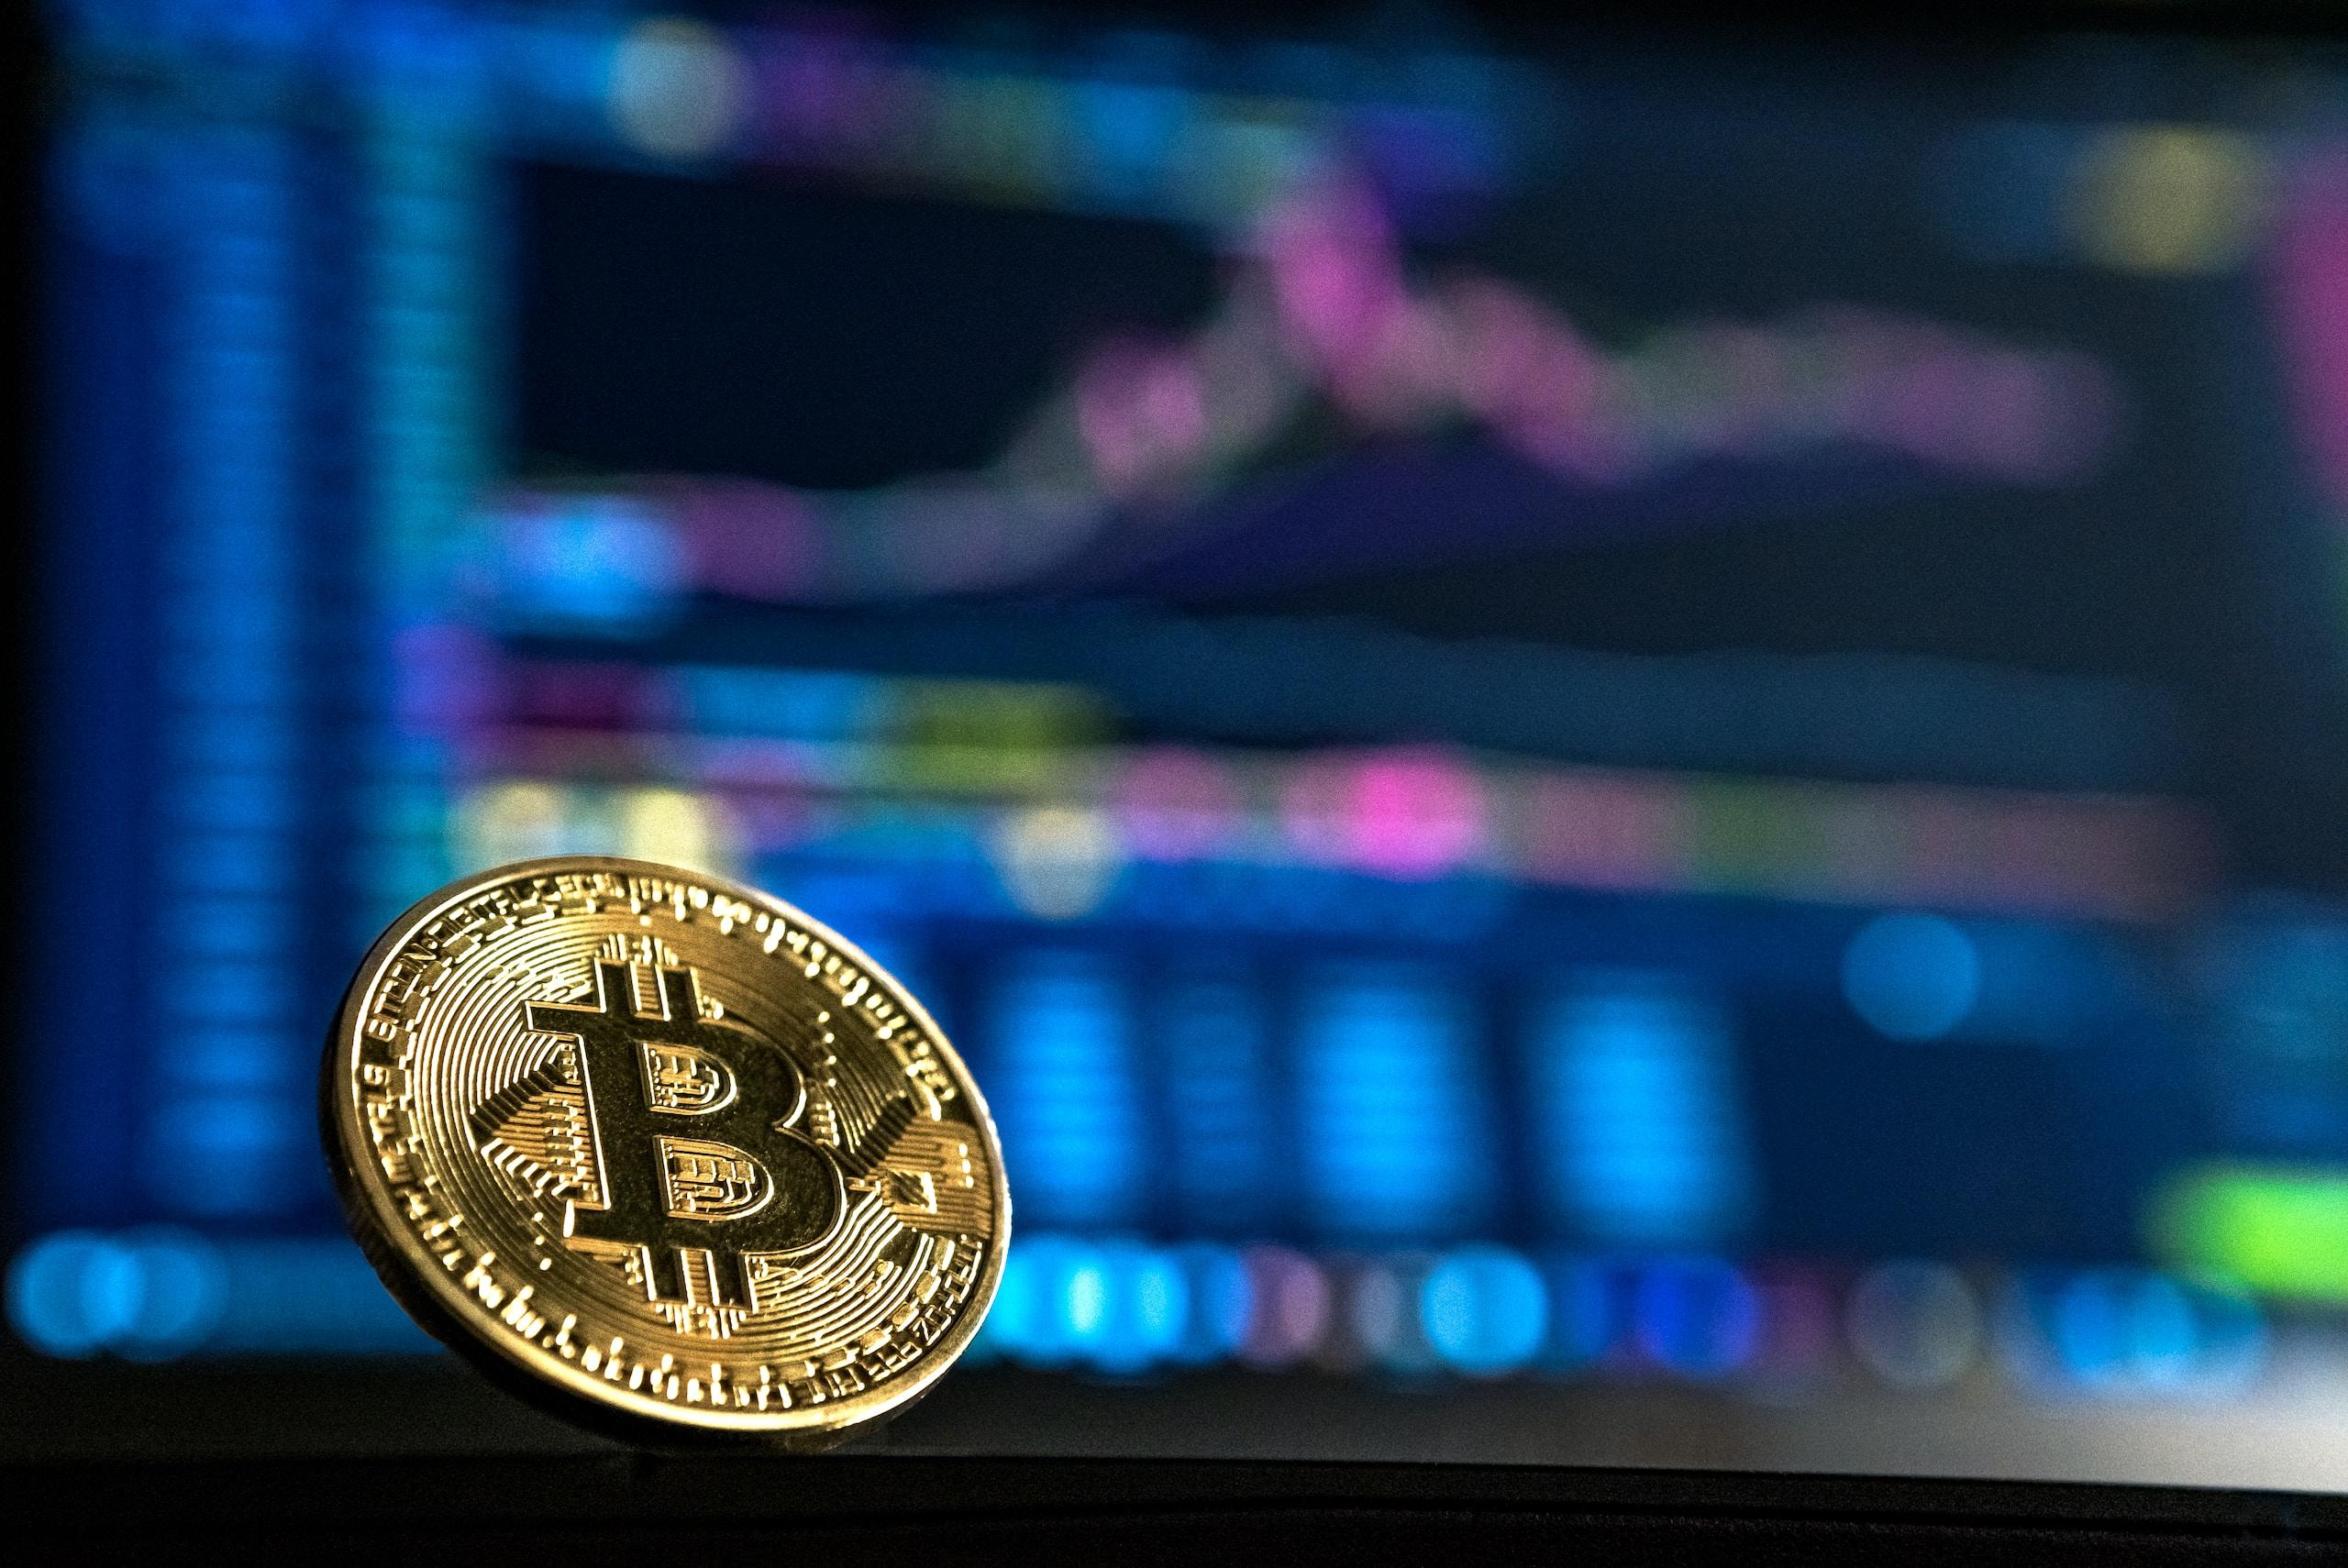 Bitcoin 升值成誘因,Barracuda:加密貨幣相關網路攻擊增加 192%